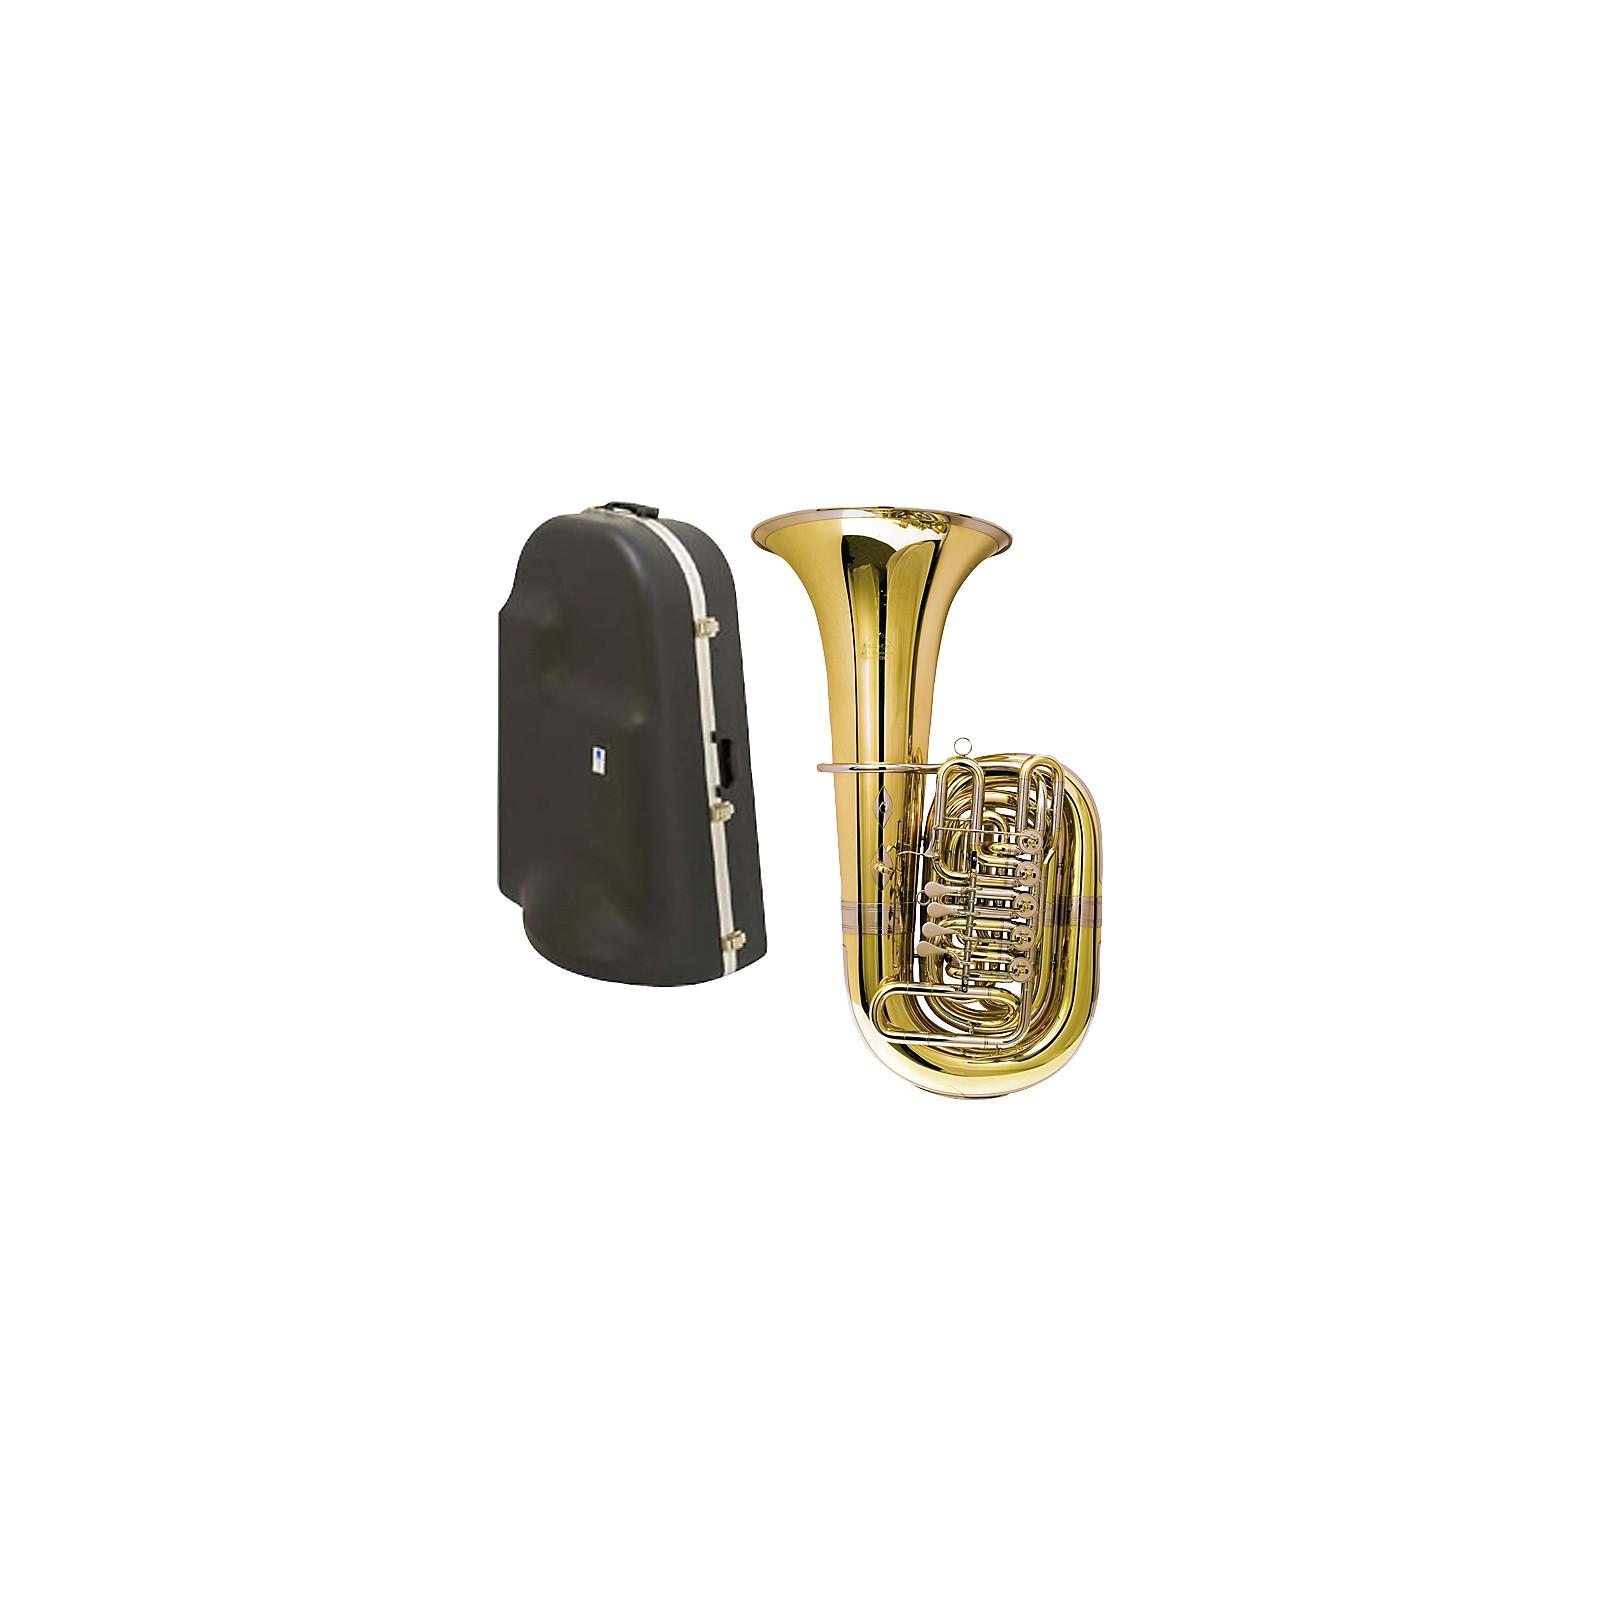 Miraphone 188-5U Series 5-Valve CC Tuba with Hard Case